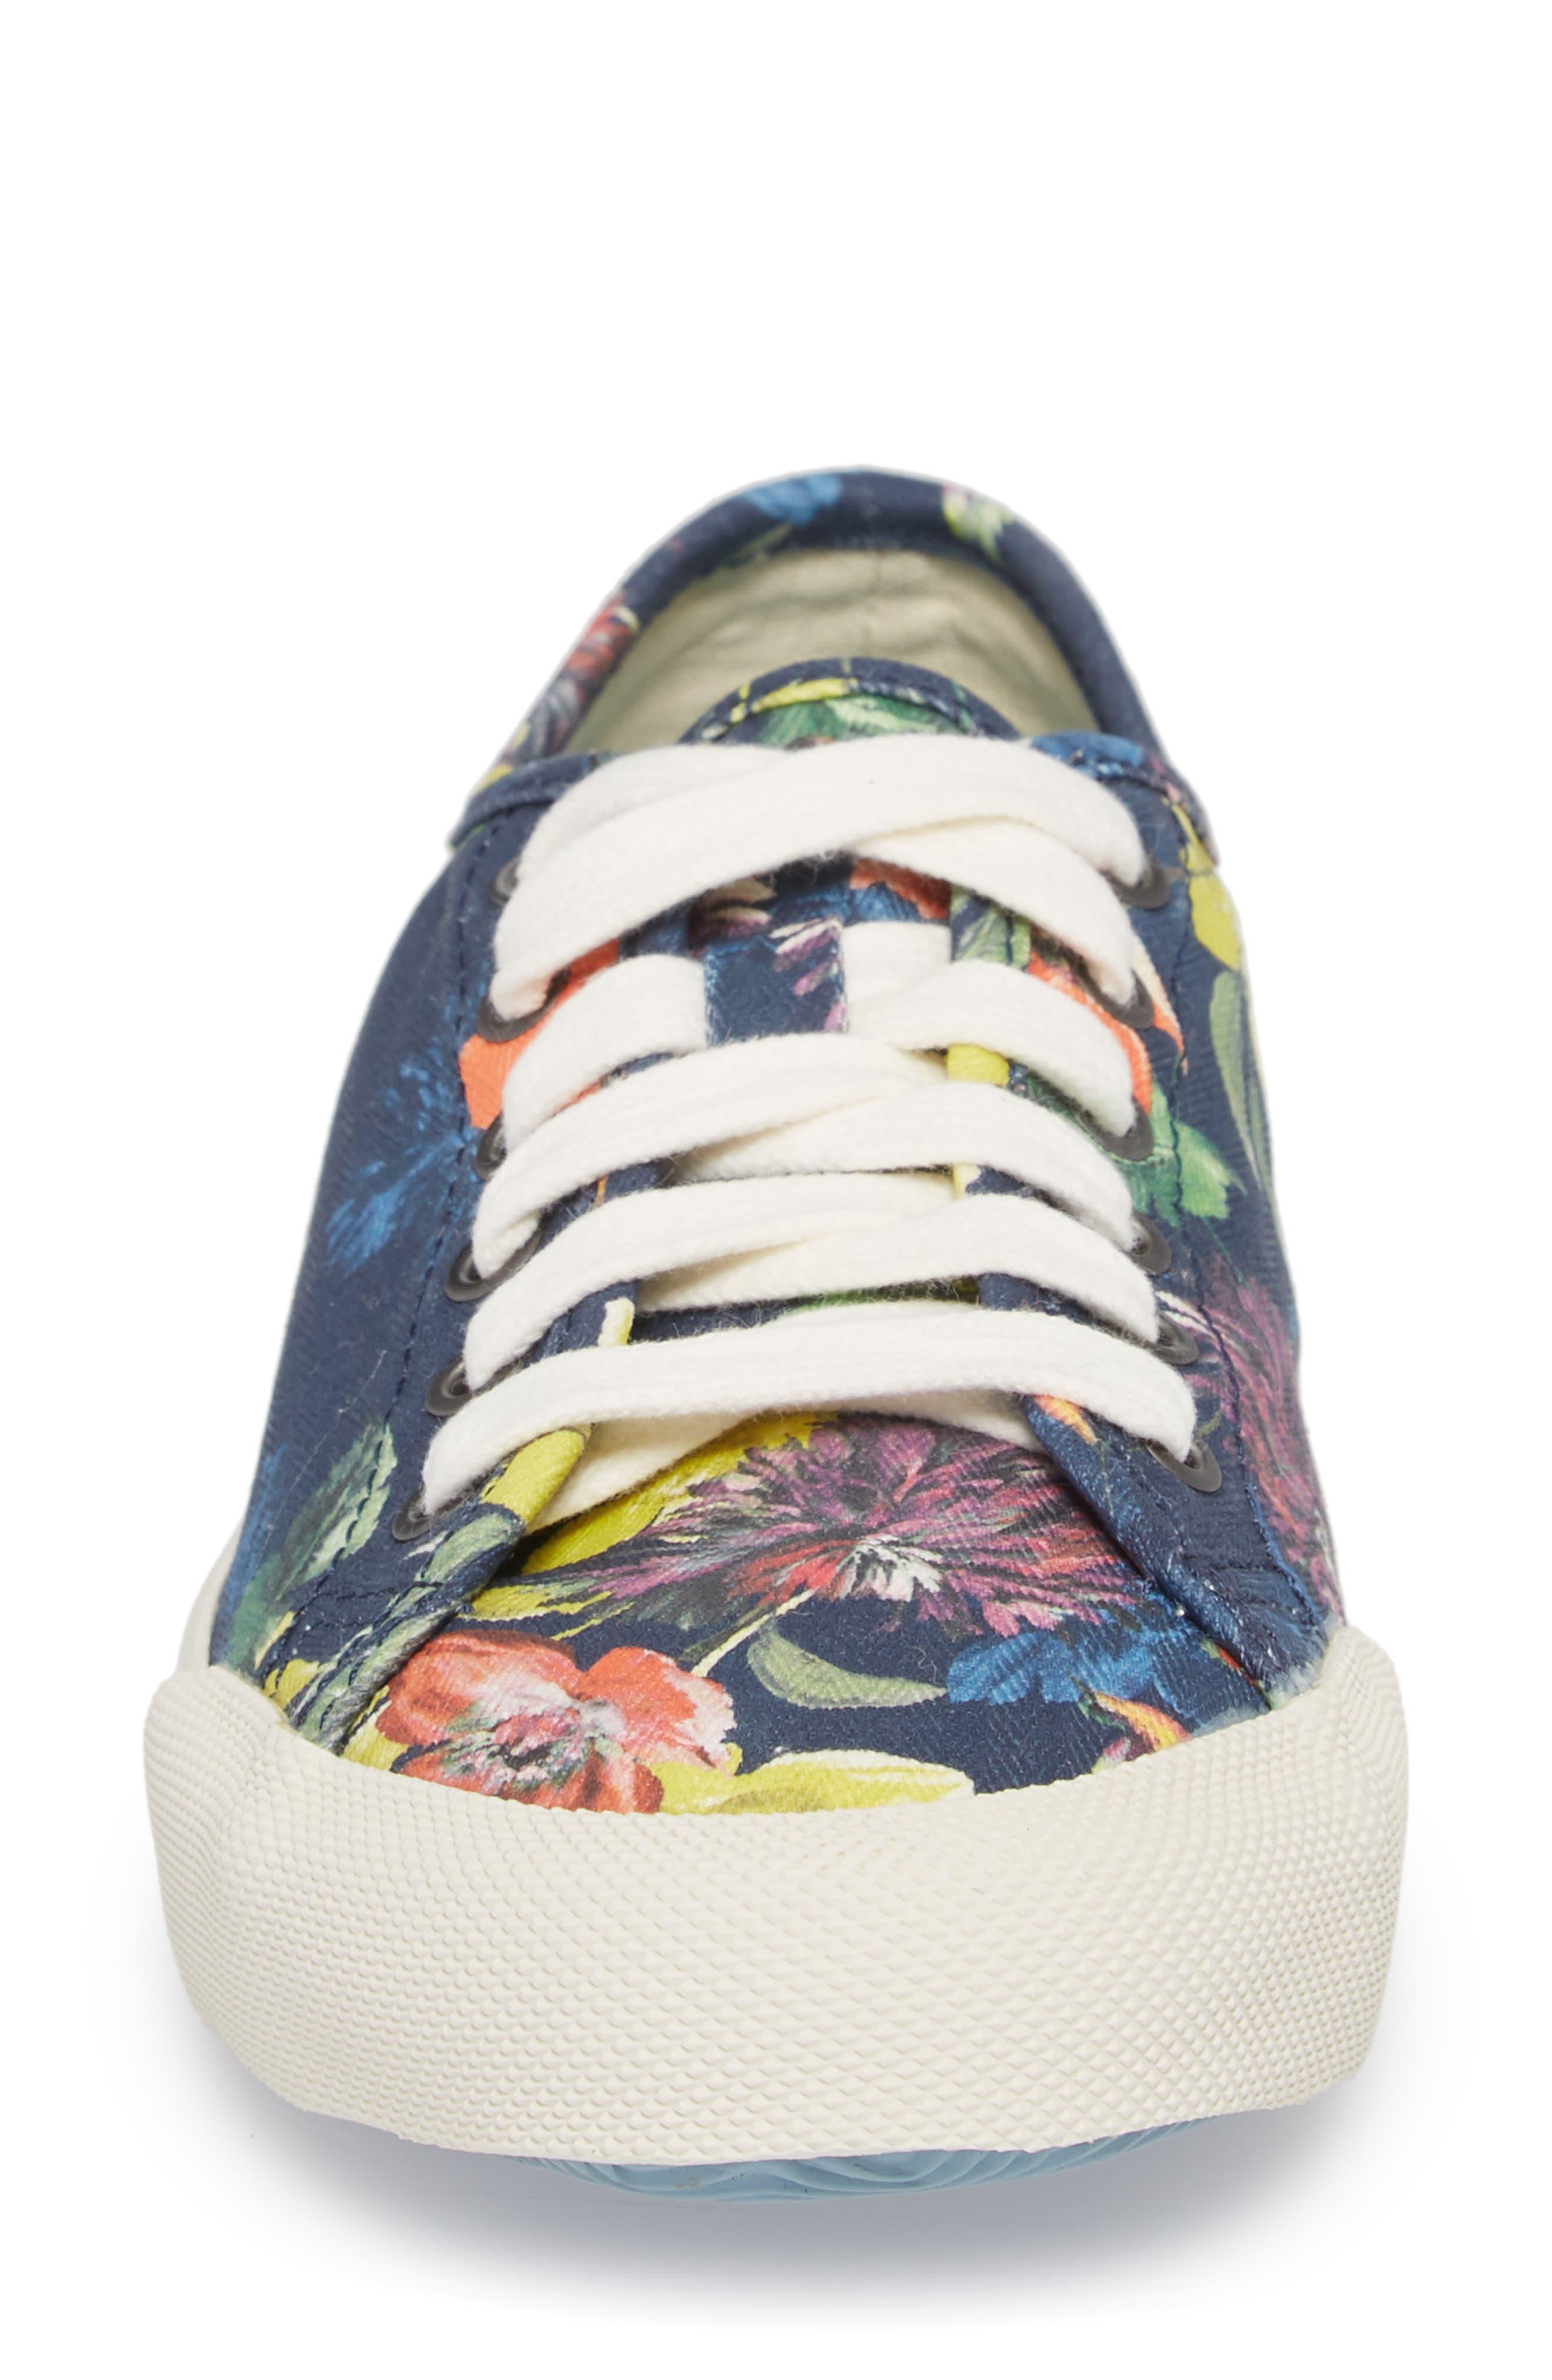 x Trina Turk Monterey Sneaker,                             Alternate thumbnail 4, color,                             Navy Chrysanthemum